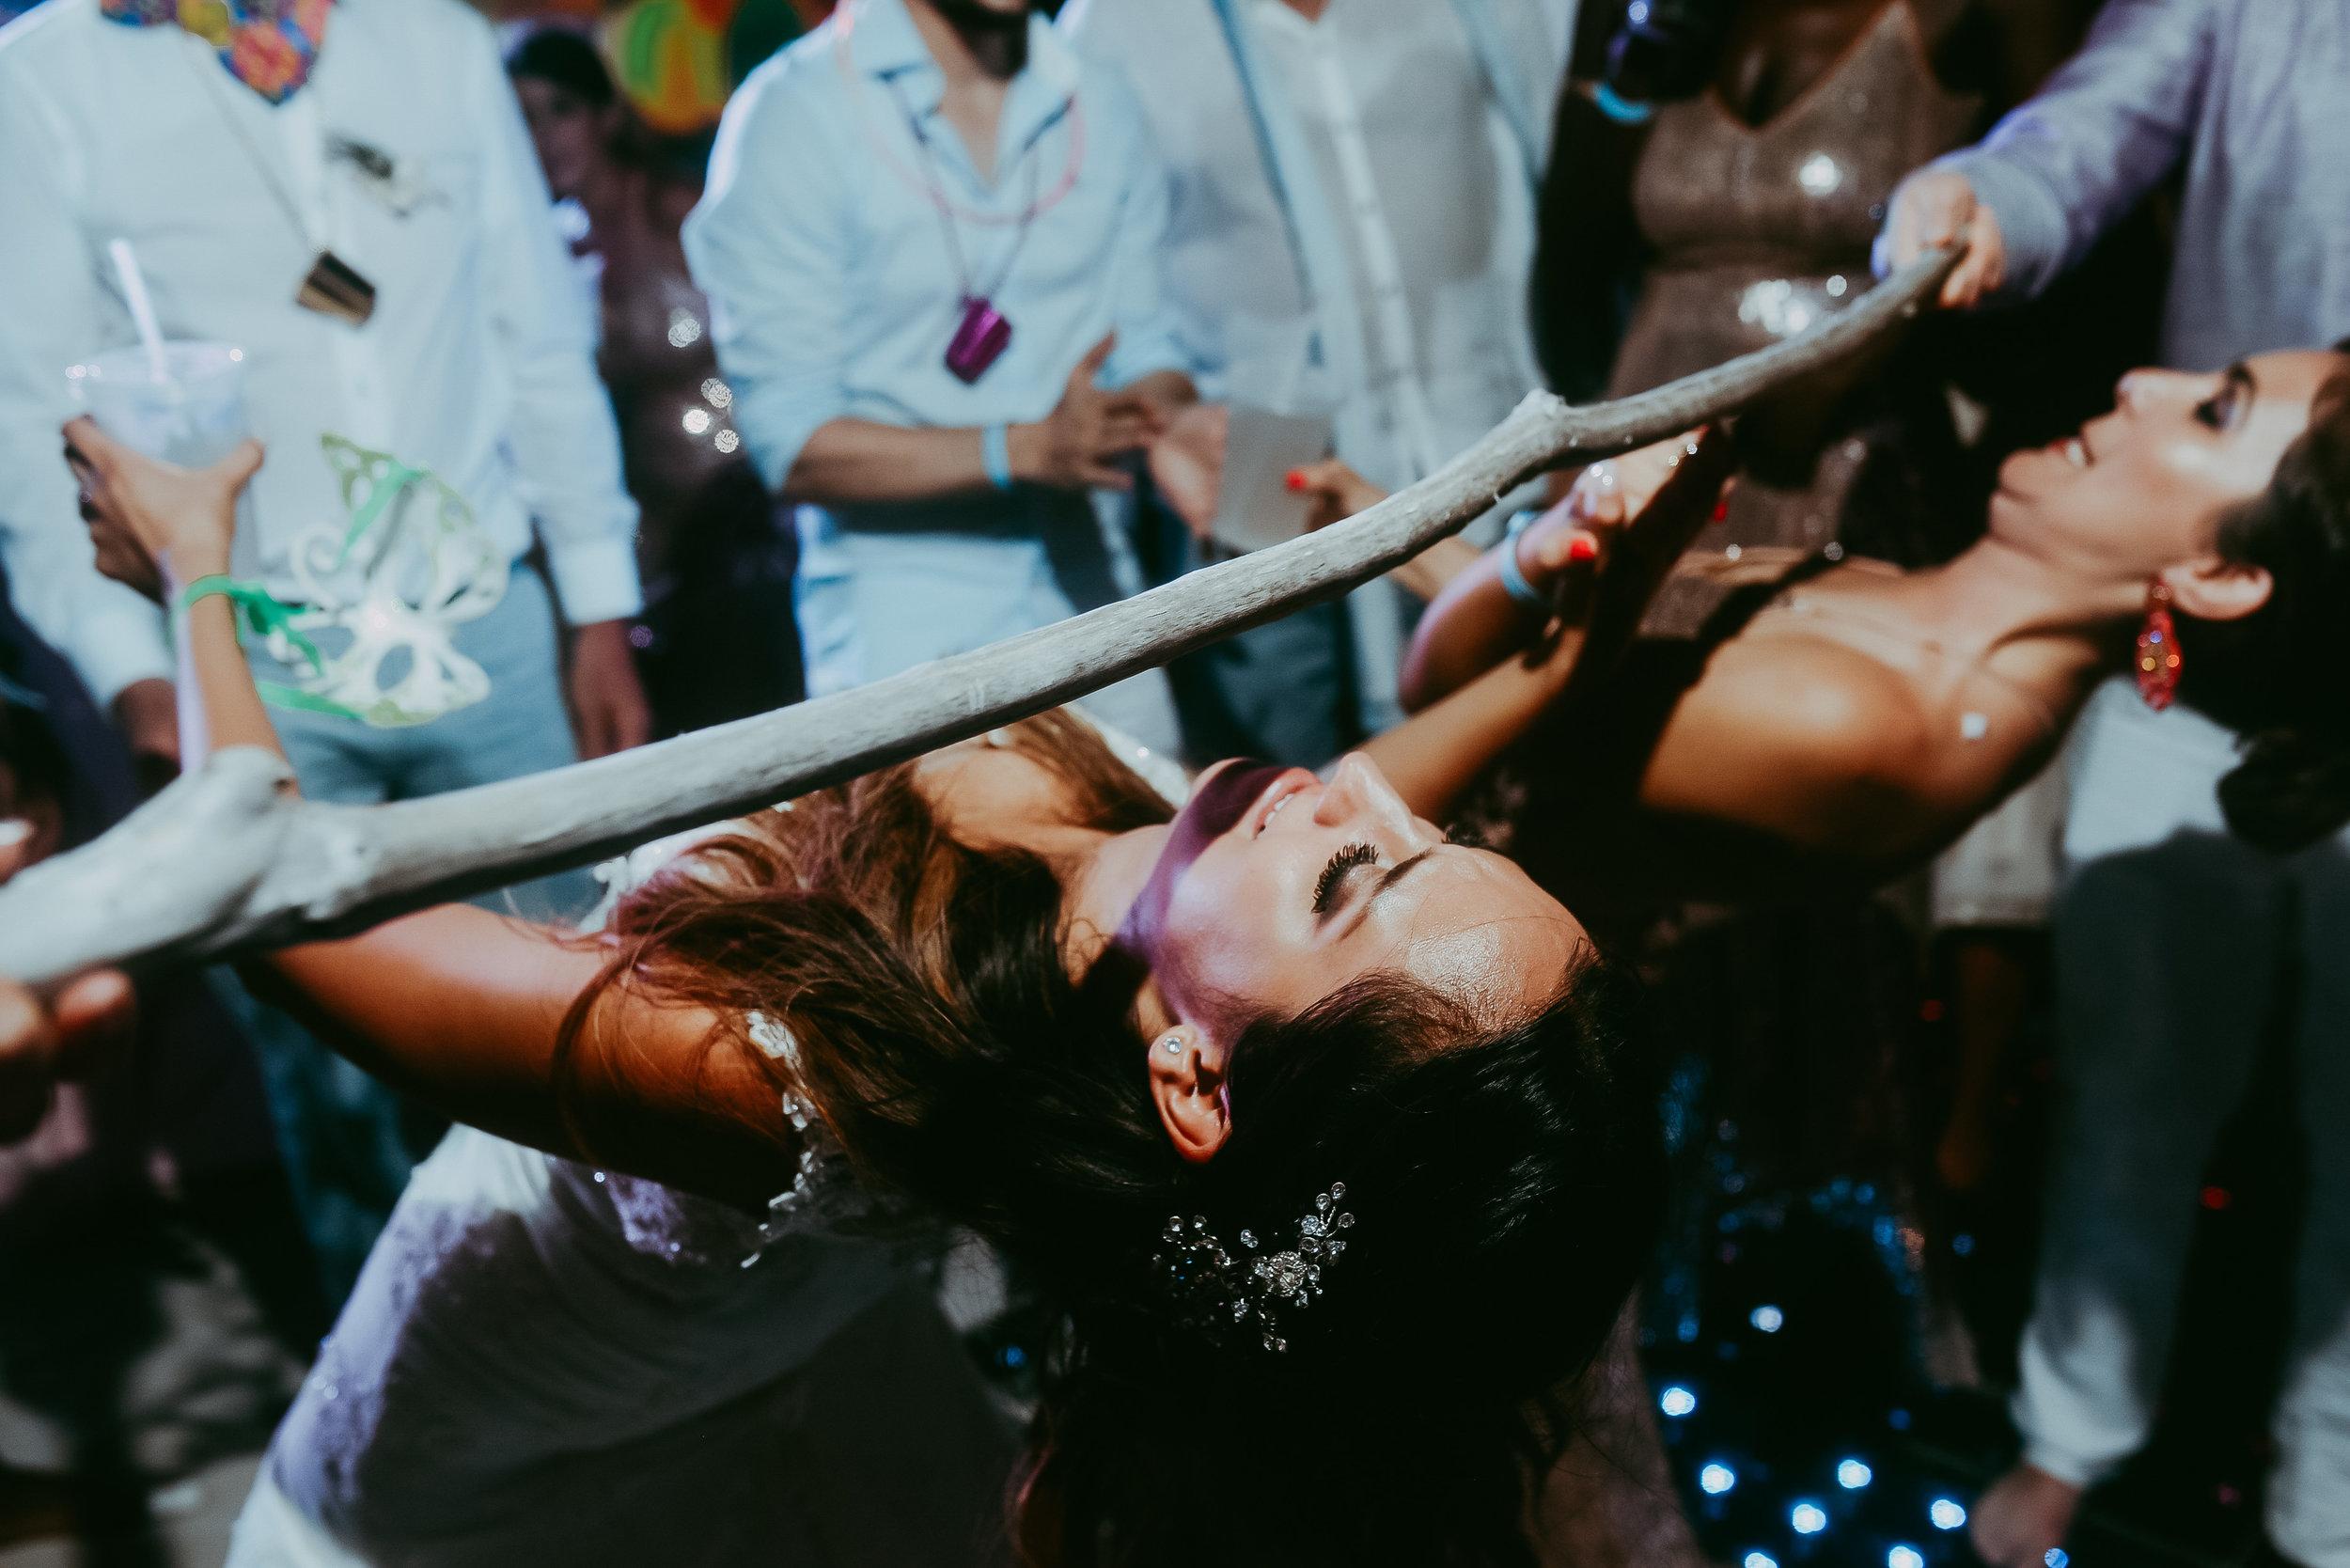 wedding playa del carmen mexico2-13.jpg